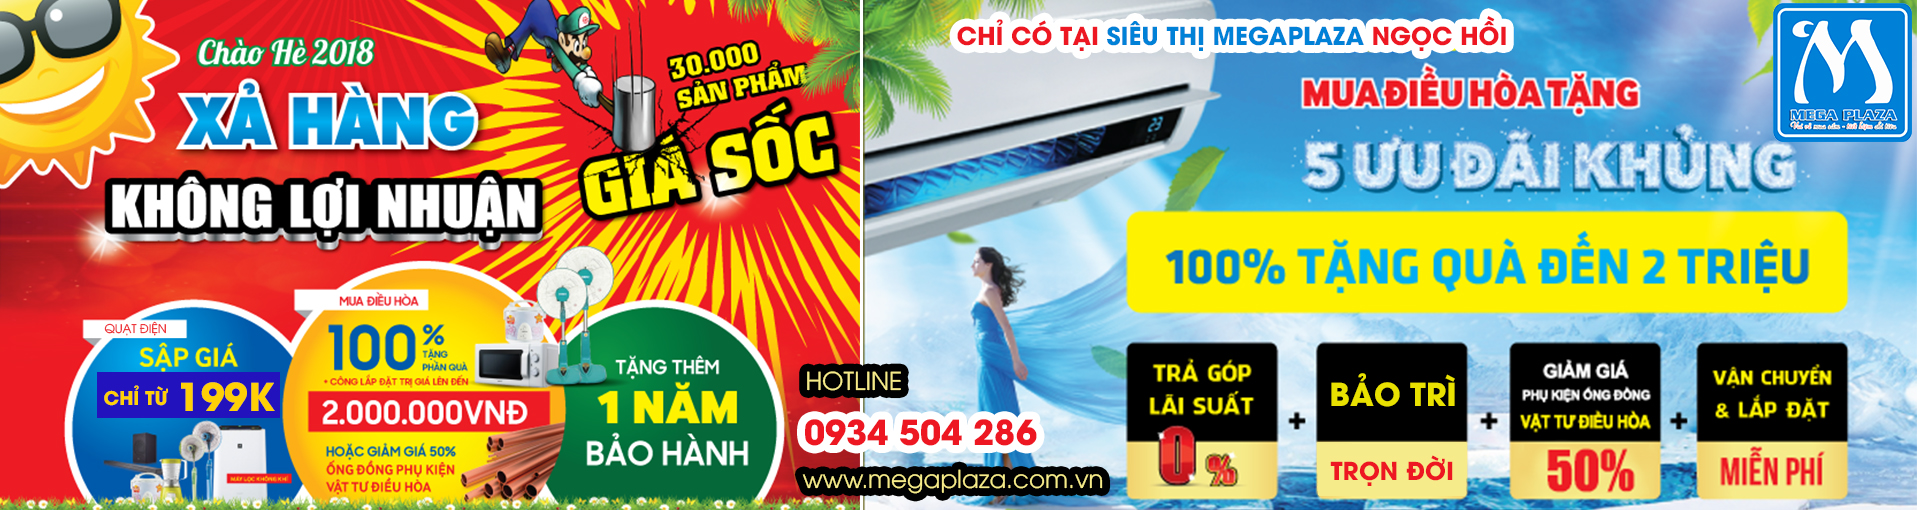 Megaplaza.com.vn